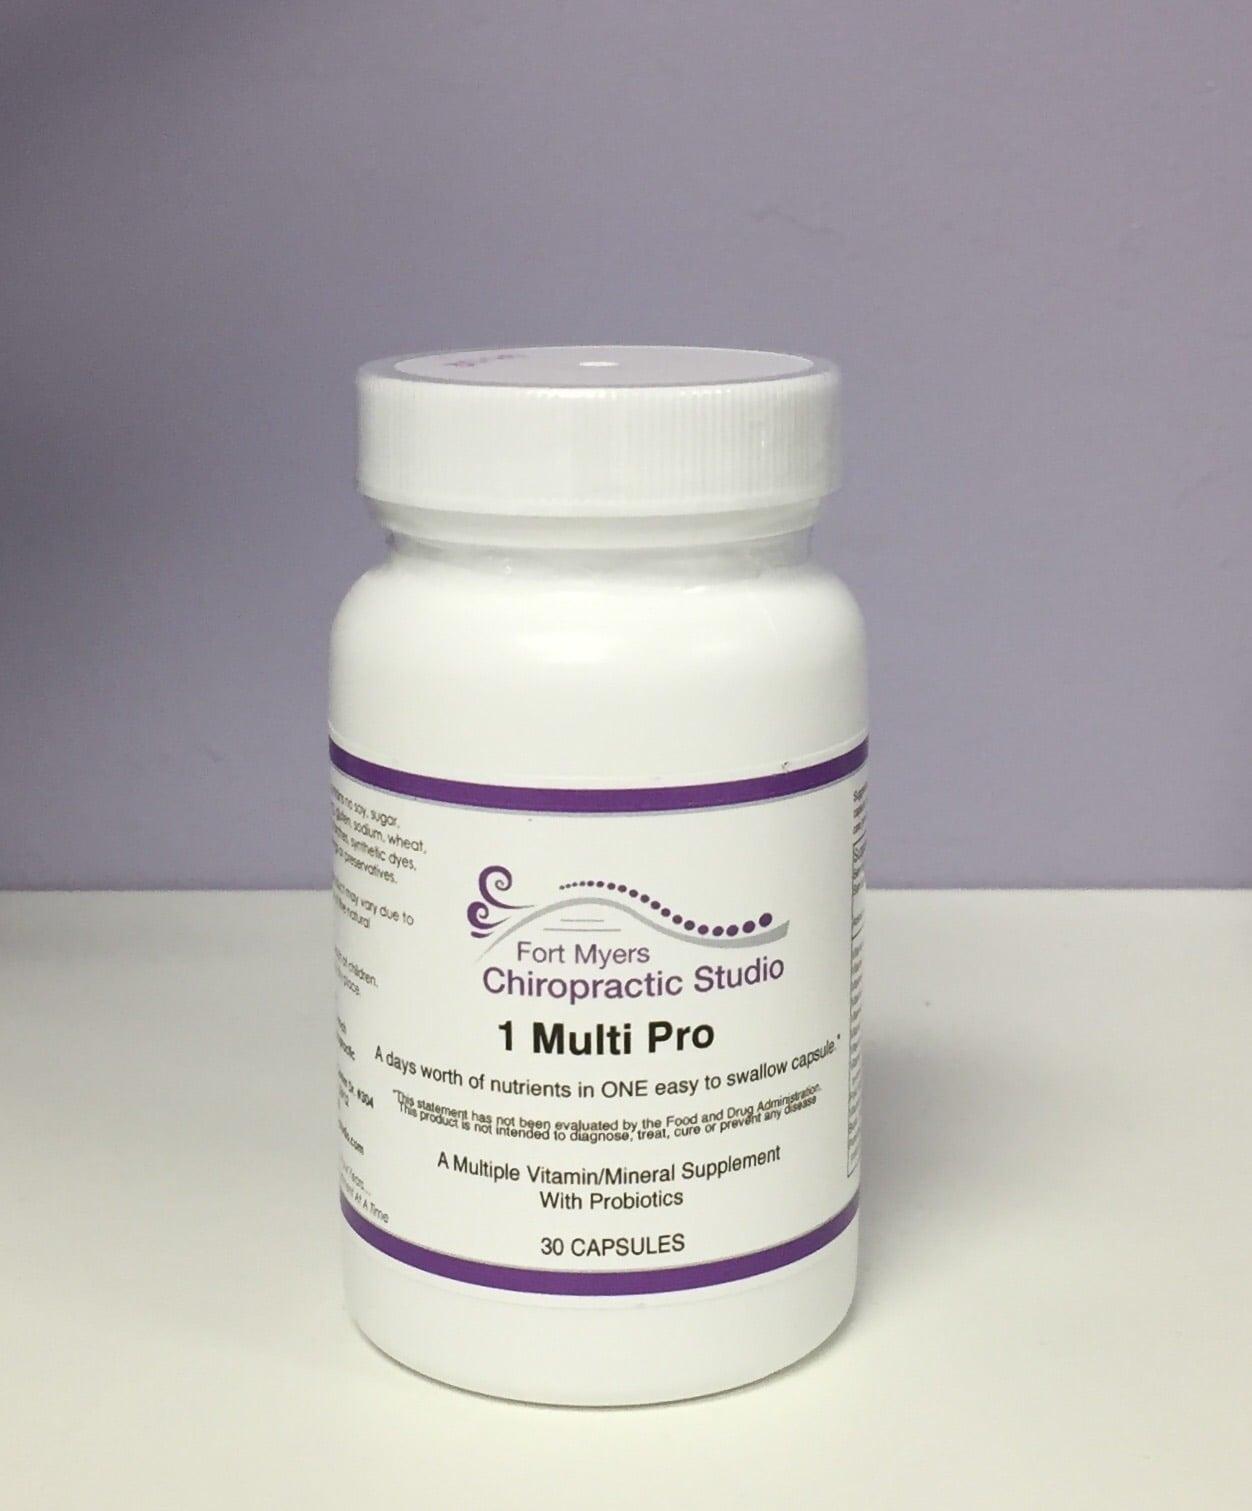 Health & Wellness Chiropractor Products   Fort Myers Chiropractic Studio